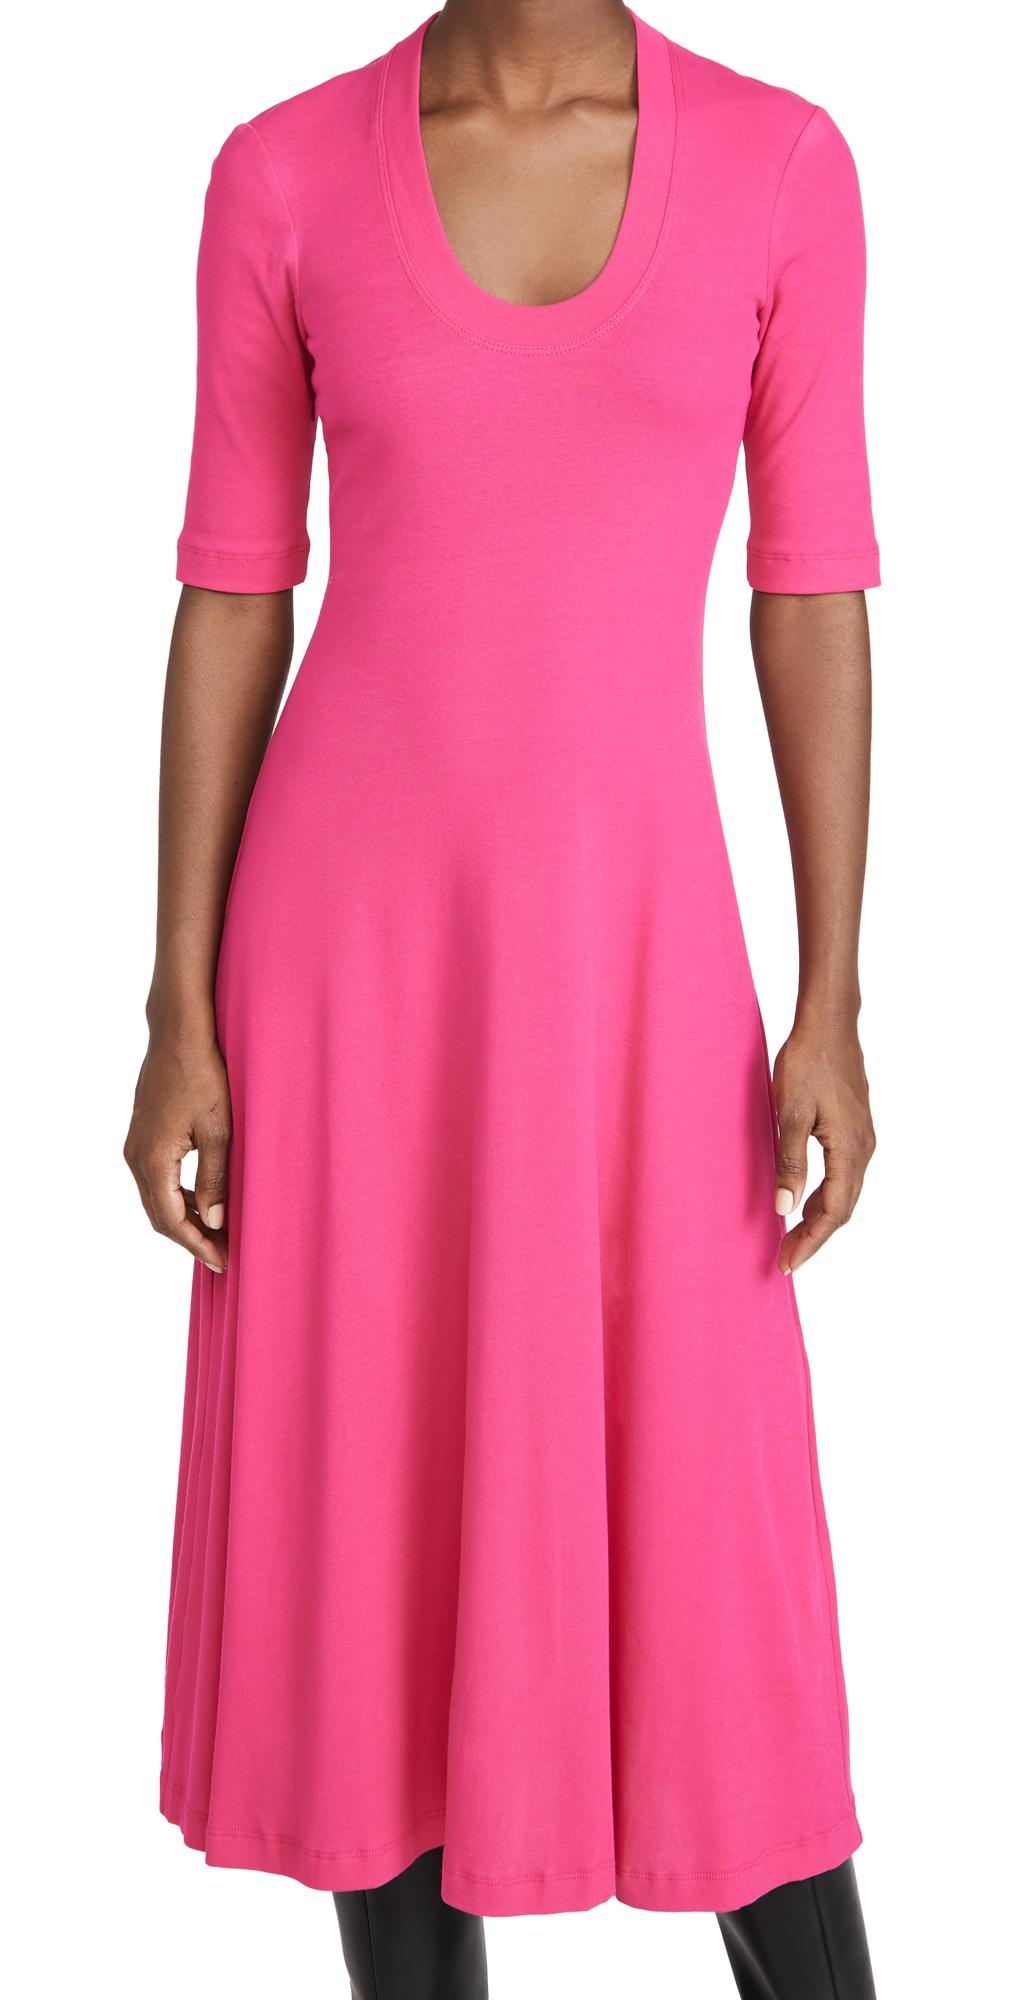 Rosetta Getty Cropped Sleeve U Neck T-Shirt Dress